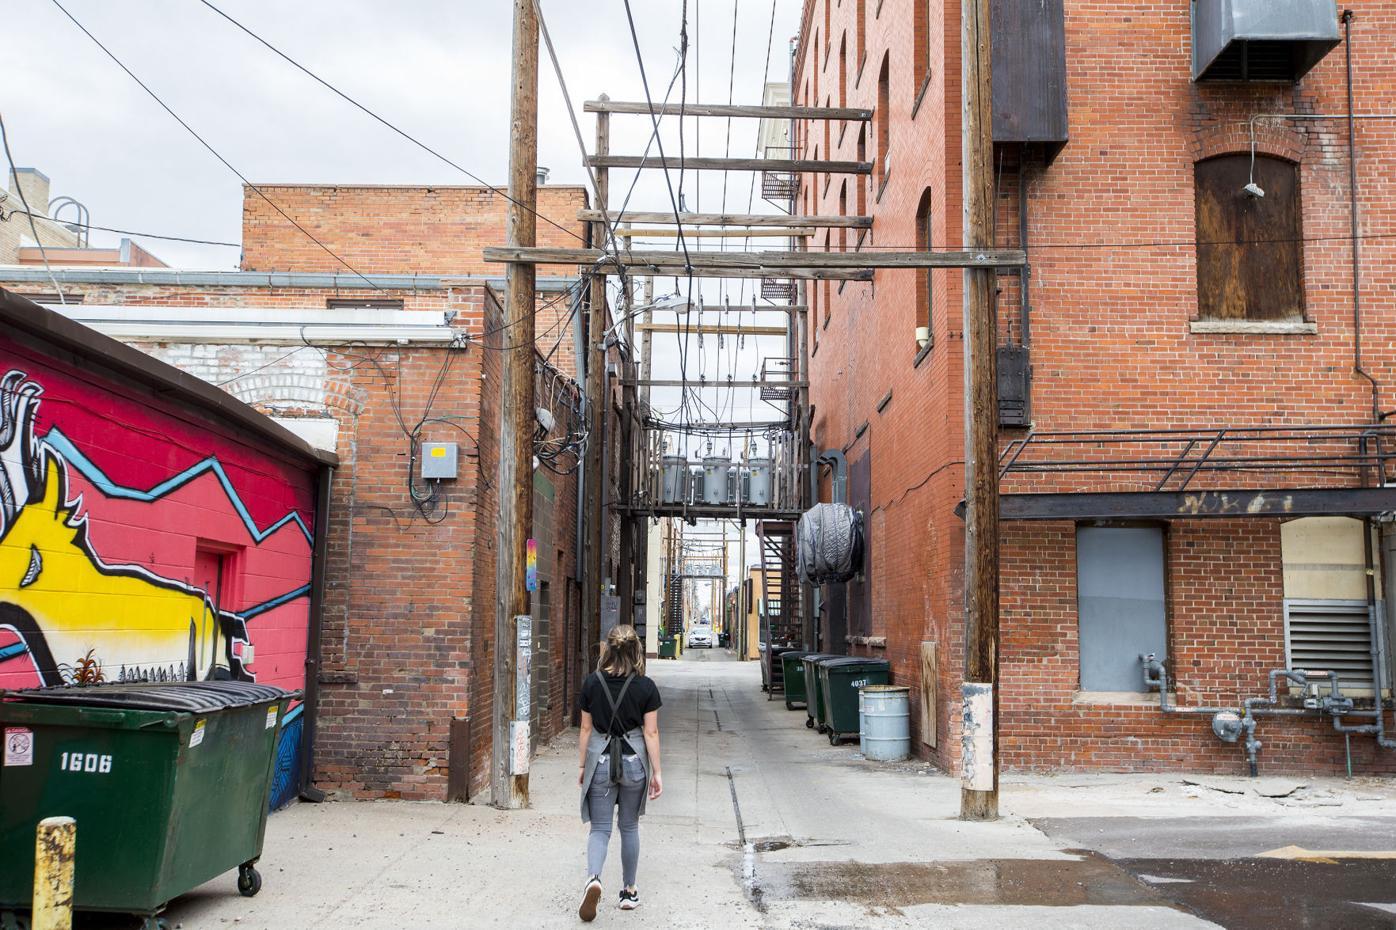 20210408-news-AlleyDowntown-rg-01